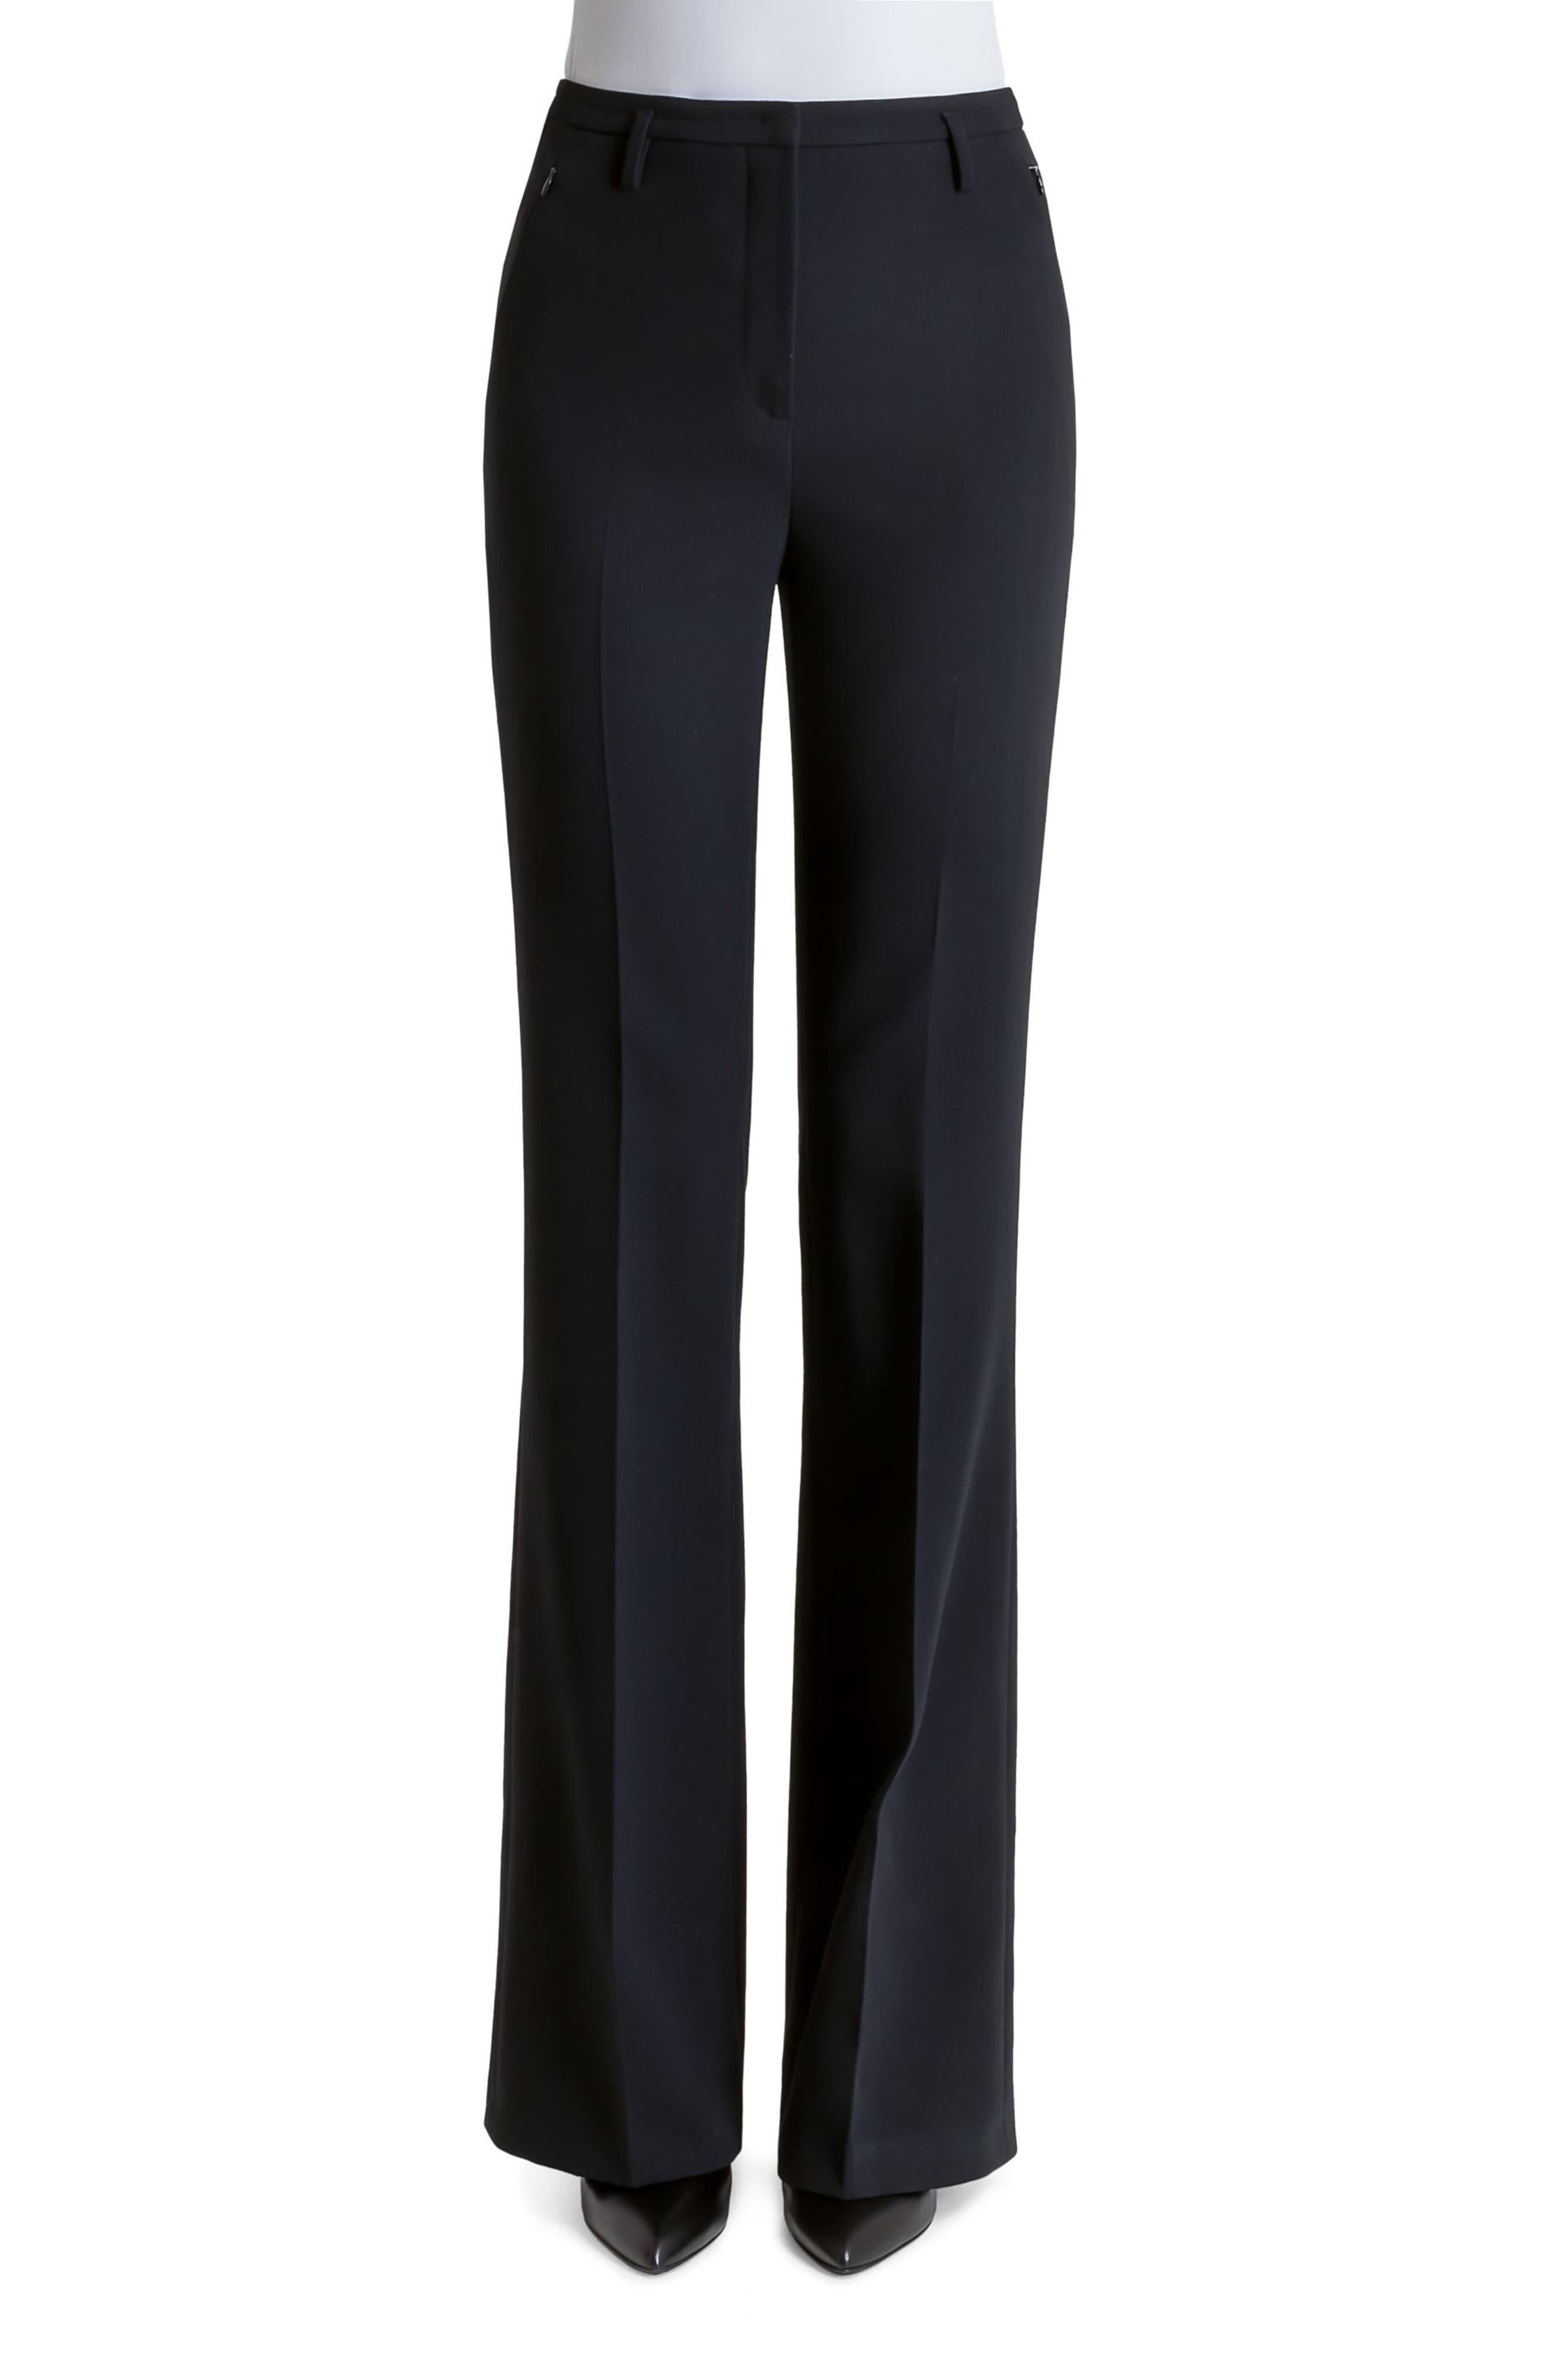 AKRIS, Farrah Stretch Wool Flare Pants, Alternate thumbnail 8, color, BLACK